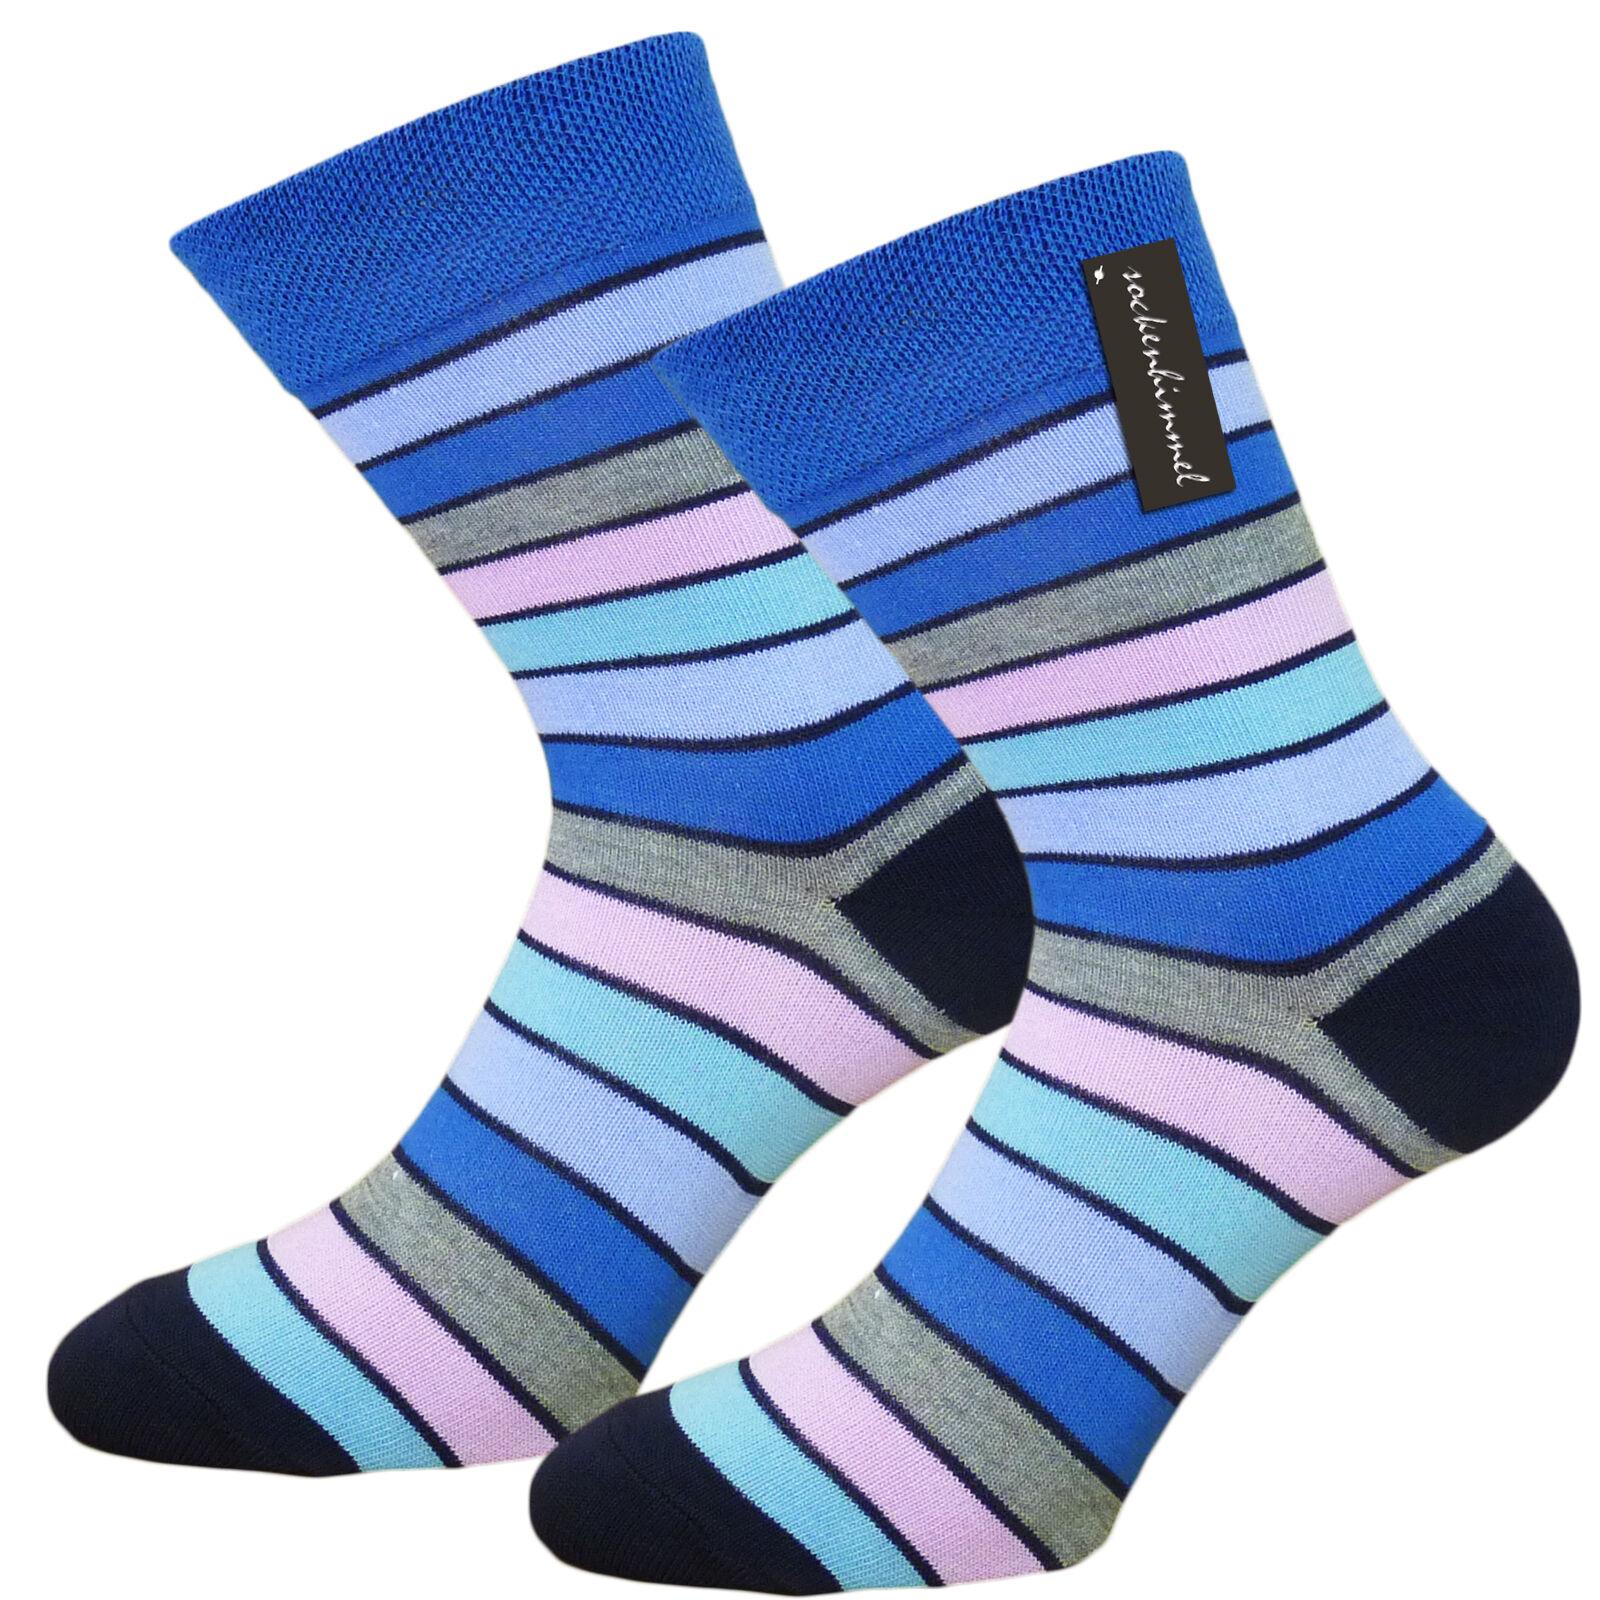 Bunte Socken Damen Ringelsocken ohne Gummidruck 6 Paar Komfortsocken Gr. 35 - 42